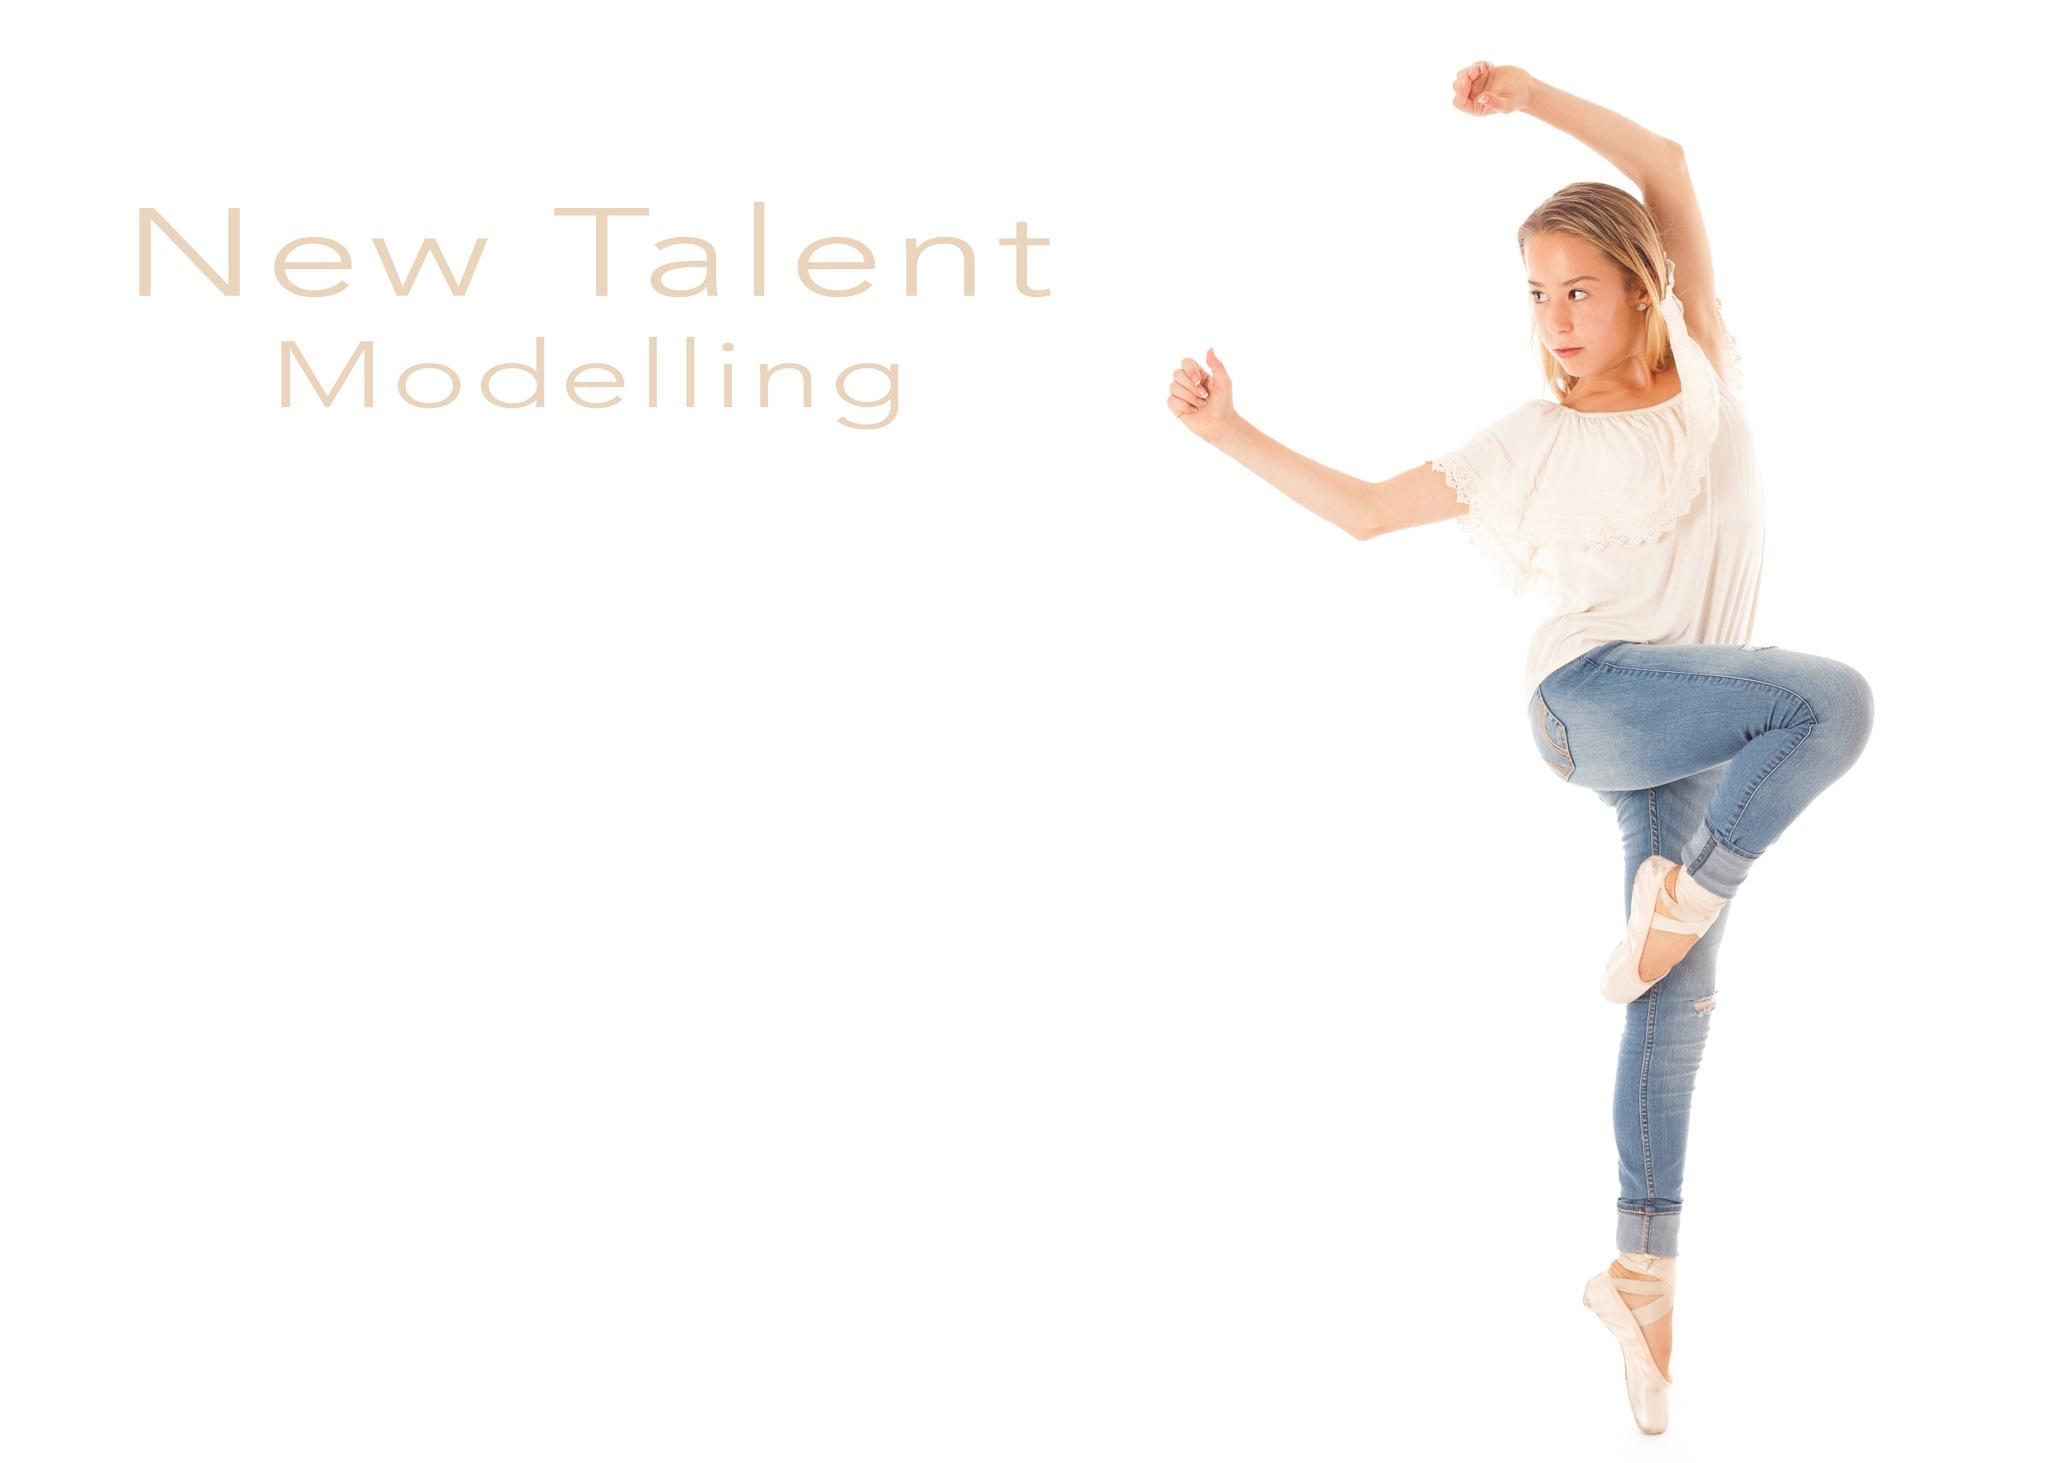 Dancer by Randi Scott